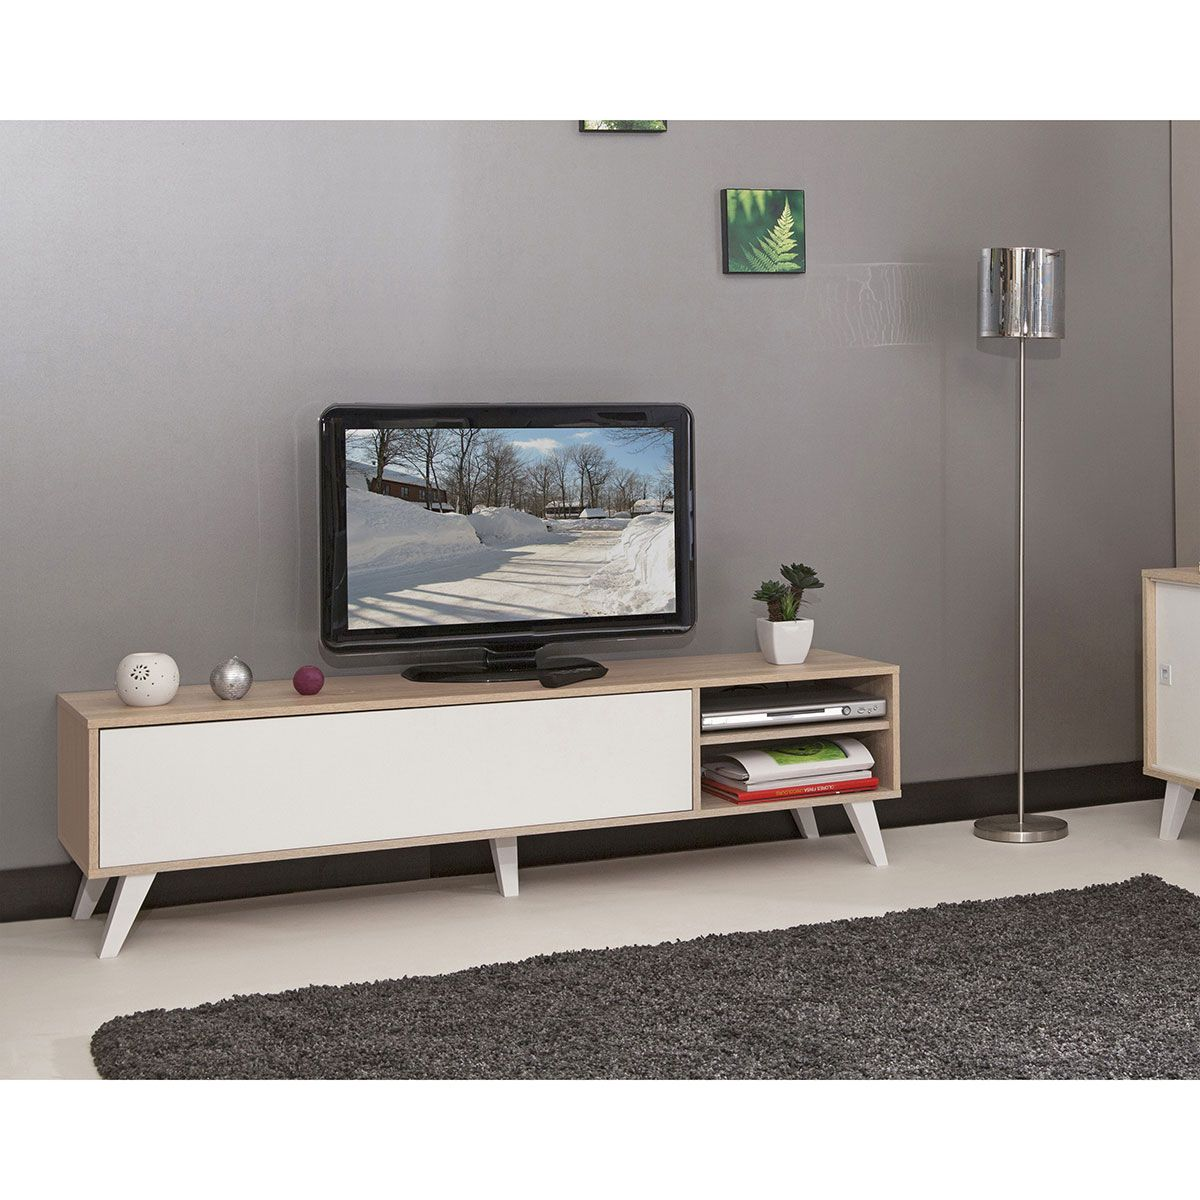 Meuble Tv Pieds Inclin S 165 Cm Ch Ne Blanc Chene Blanc Meuble  # Meuble Tv Chene Blanc